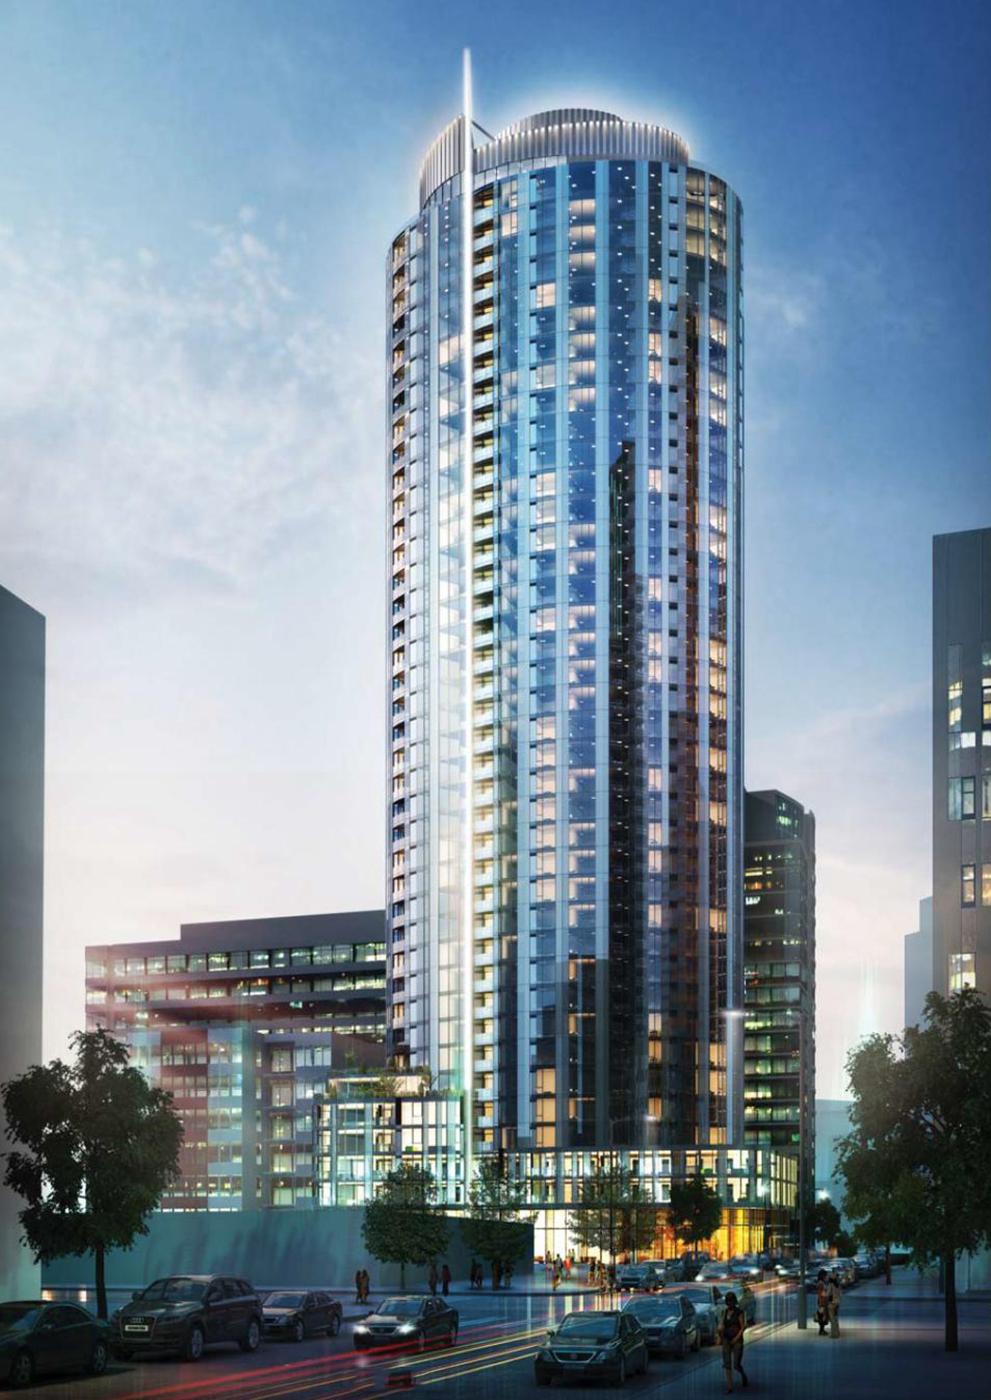 Seattle 2202 Eighth Ave Mckenzie 440 Ft 40 Floors